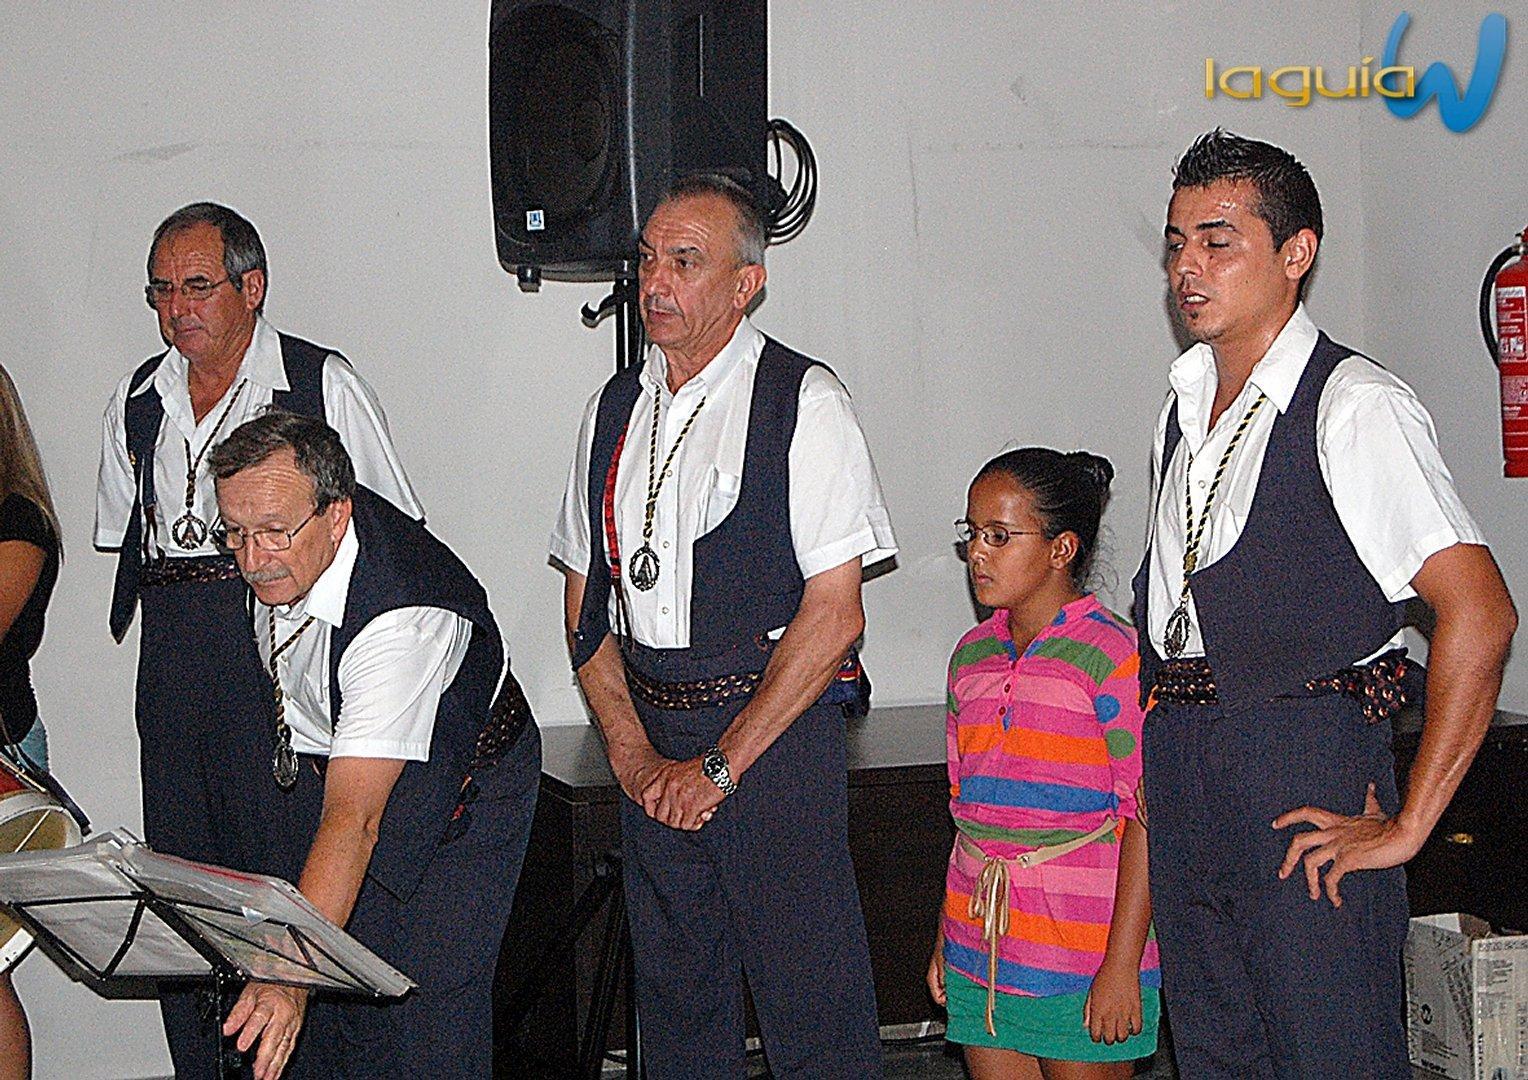 Romeria rociera 2012 archena Presentacion pregon